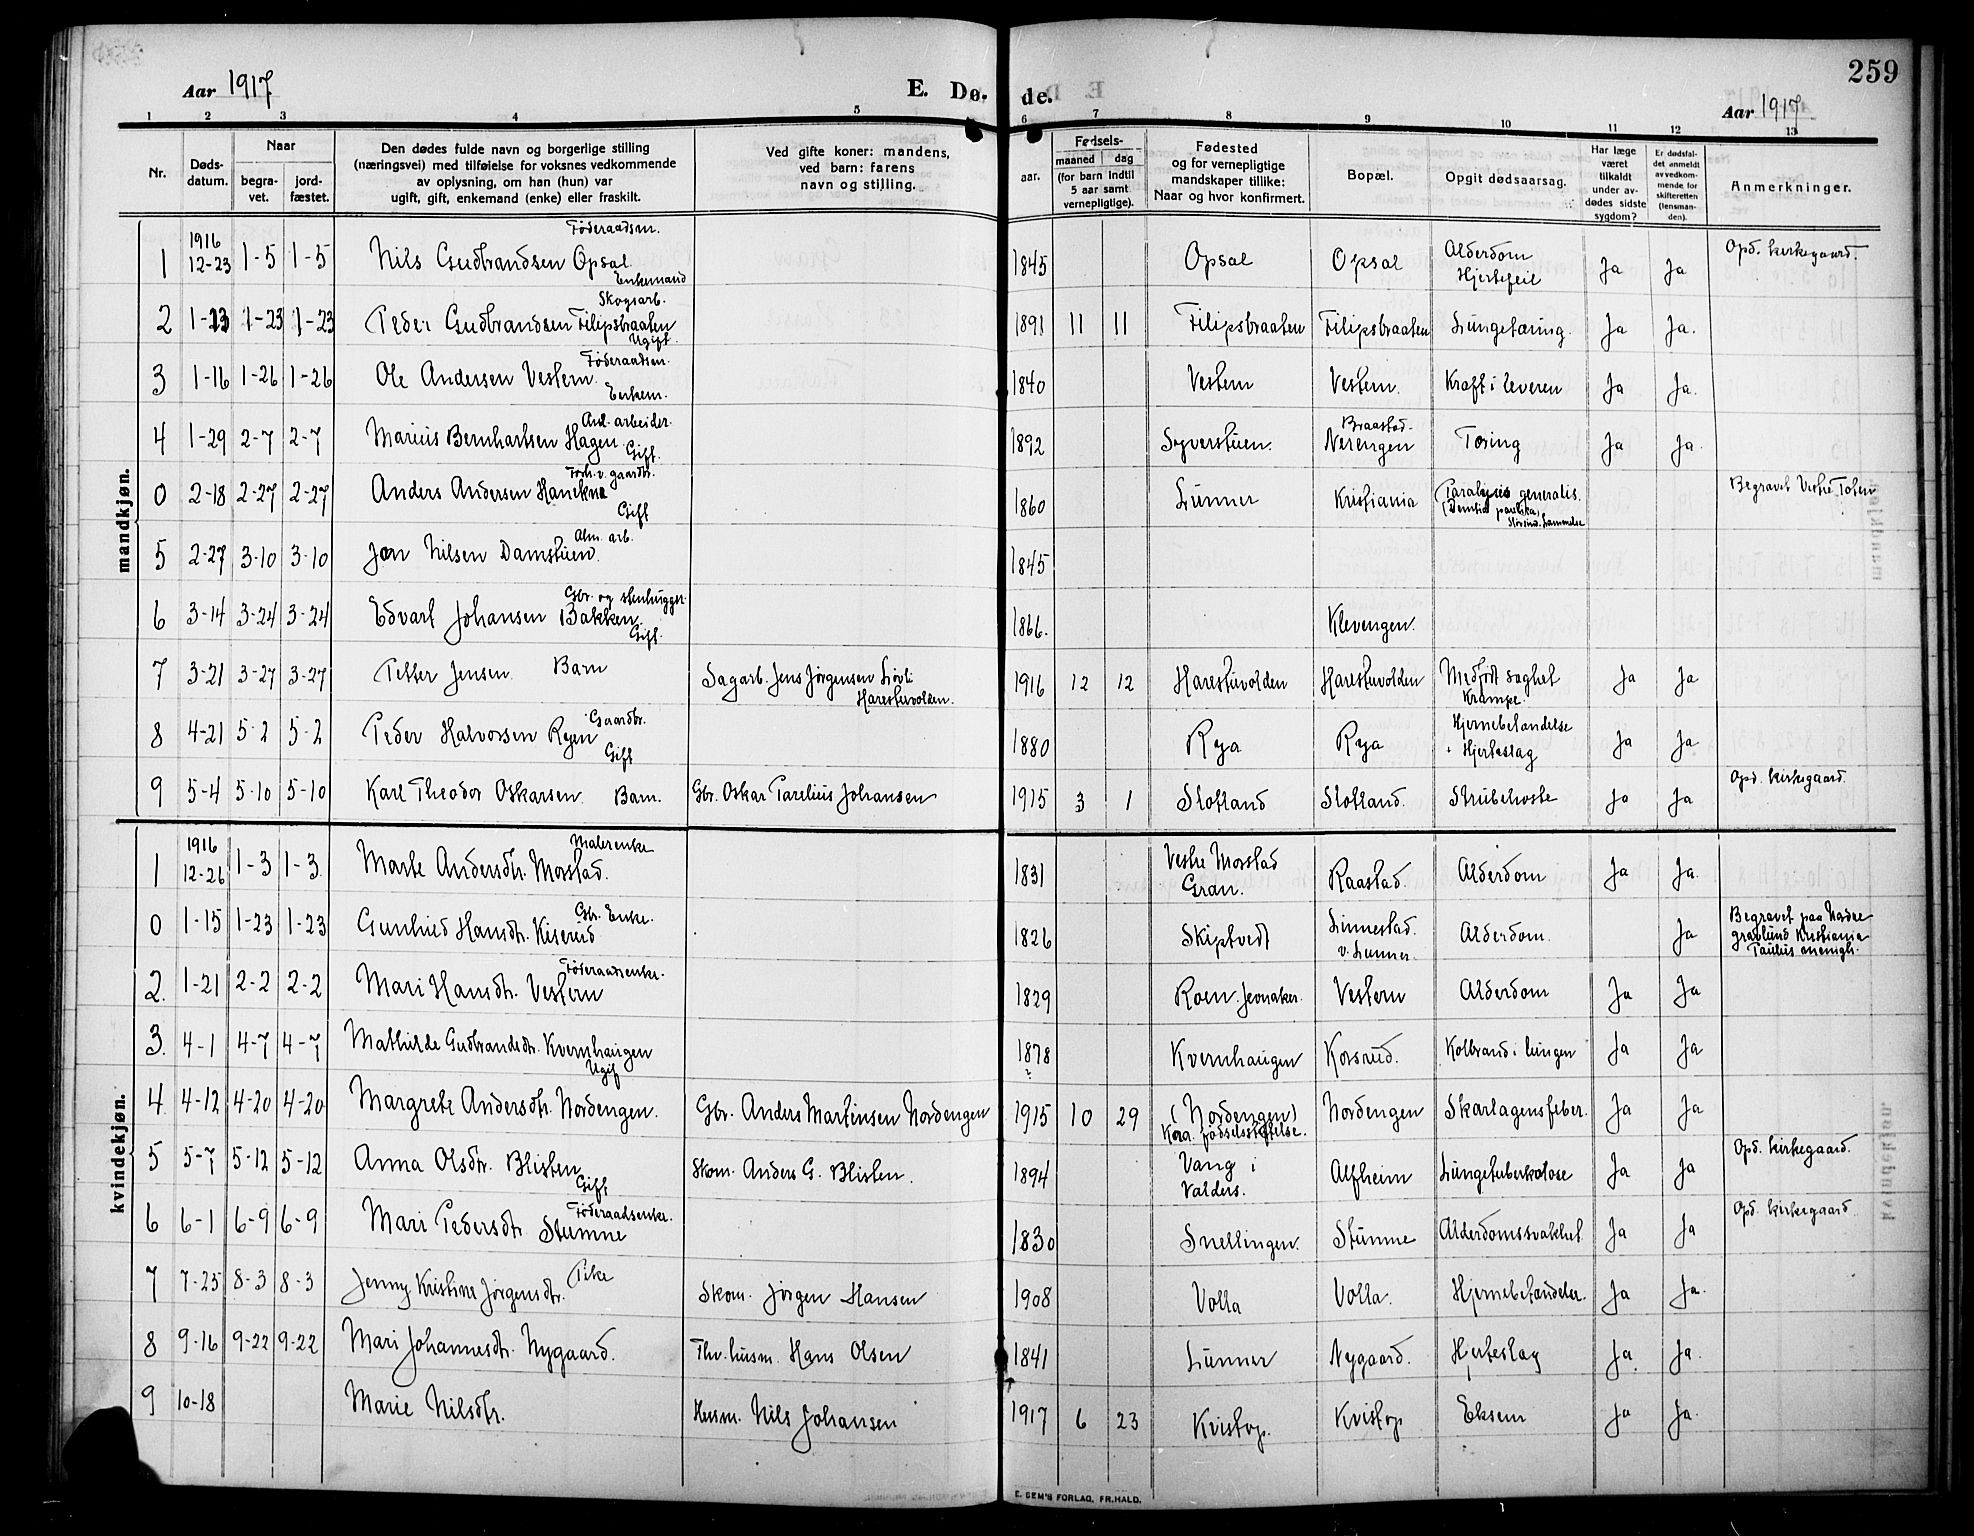 SAH, Lunner prestekontor, H/Ha/Hab/L0001: Klokkerbok nr. 1, 1909-1922, s. 259